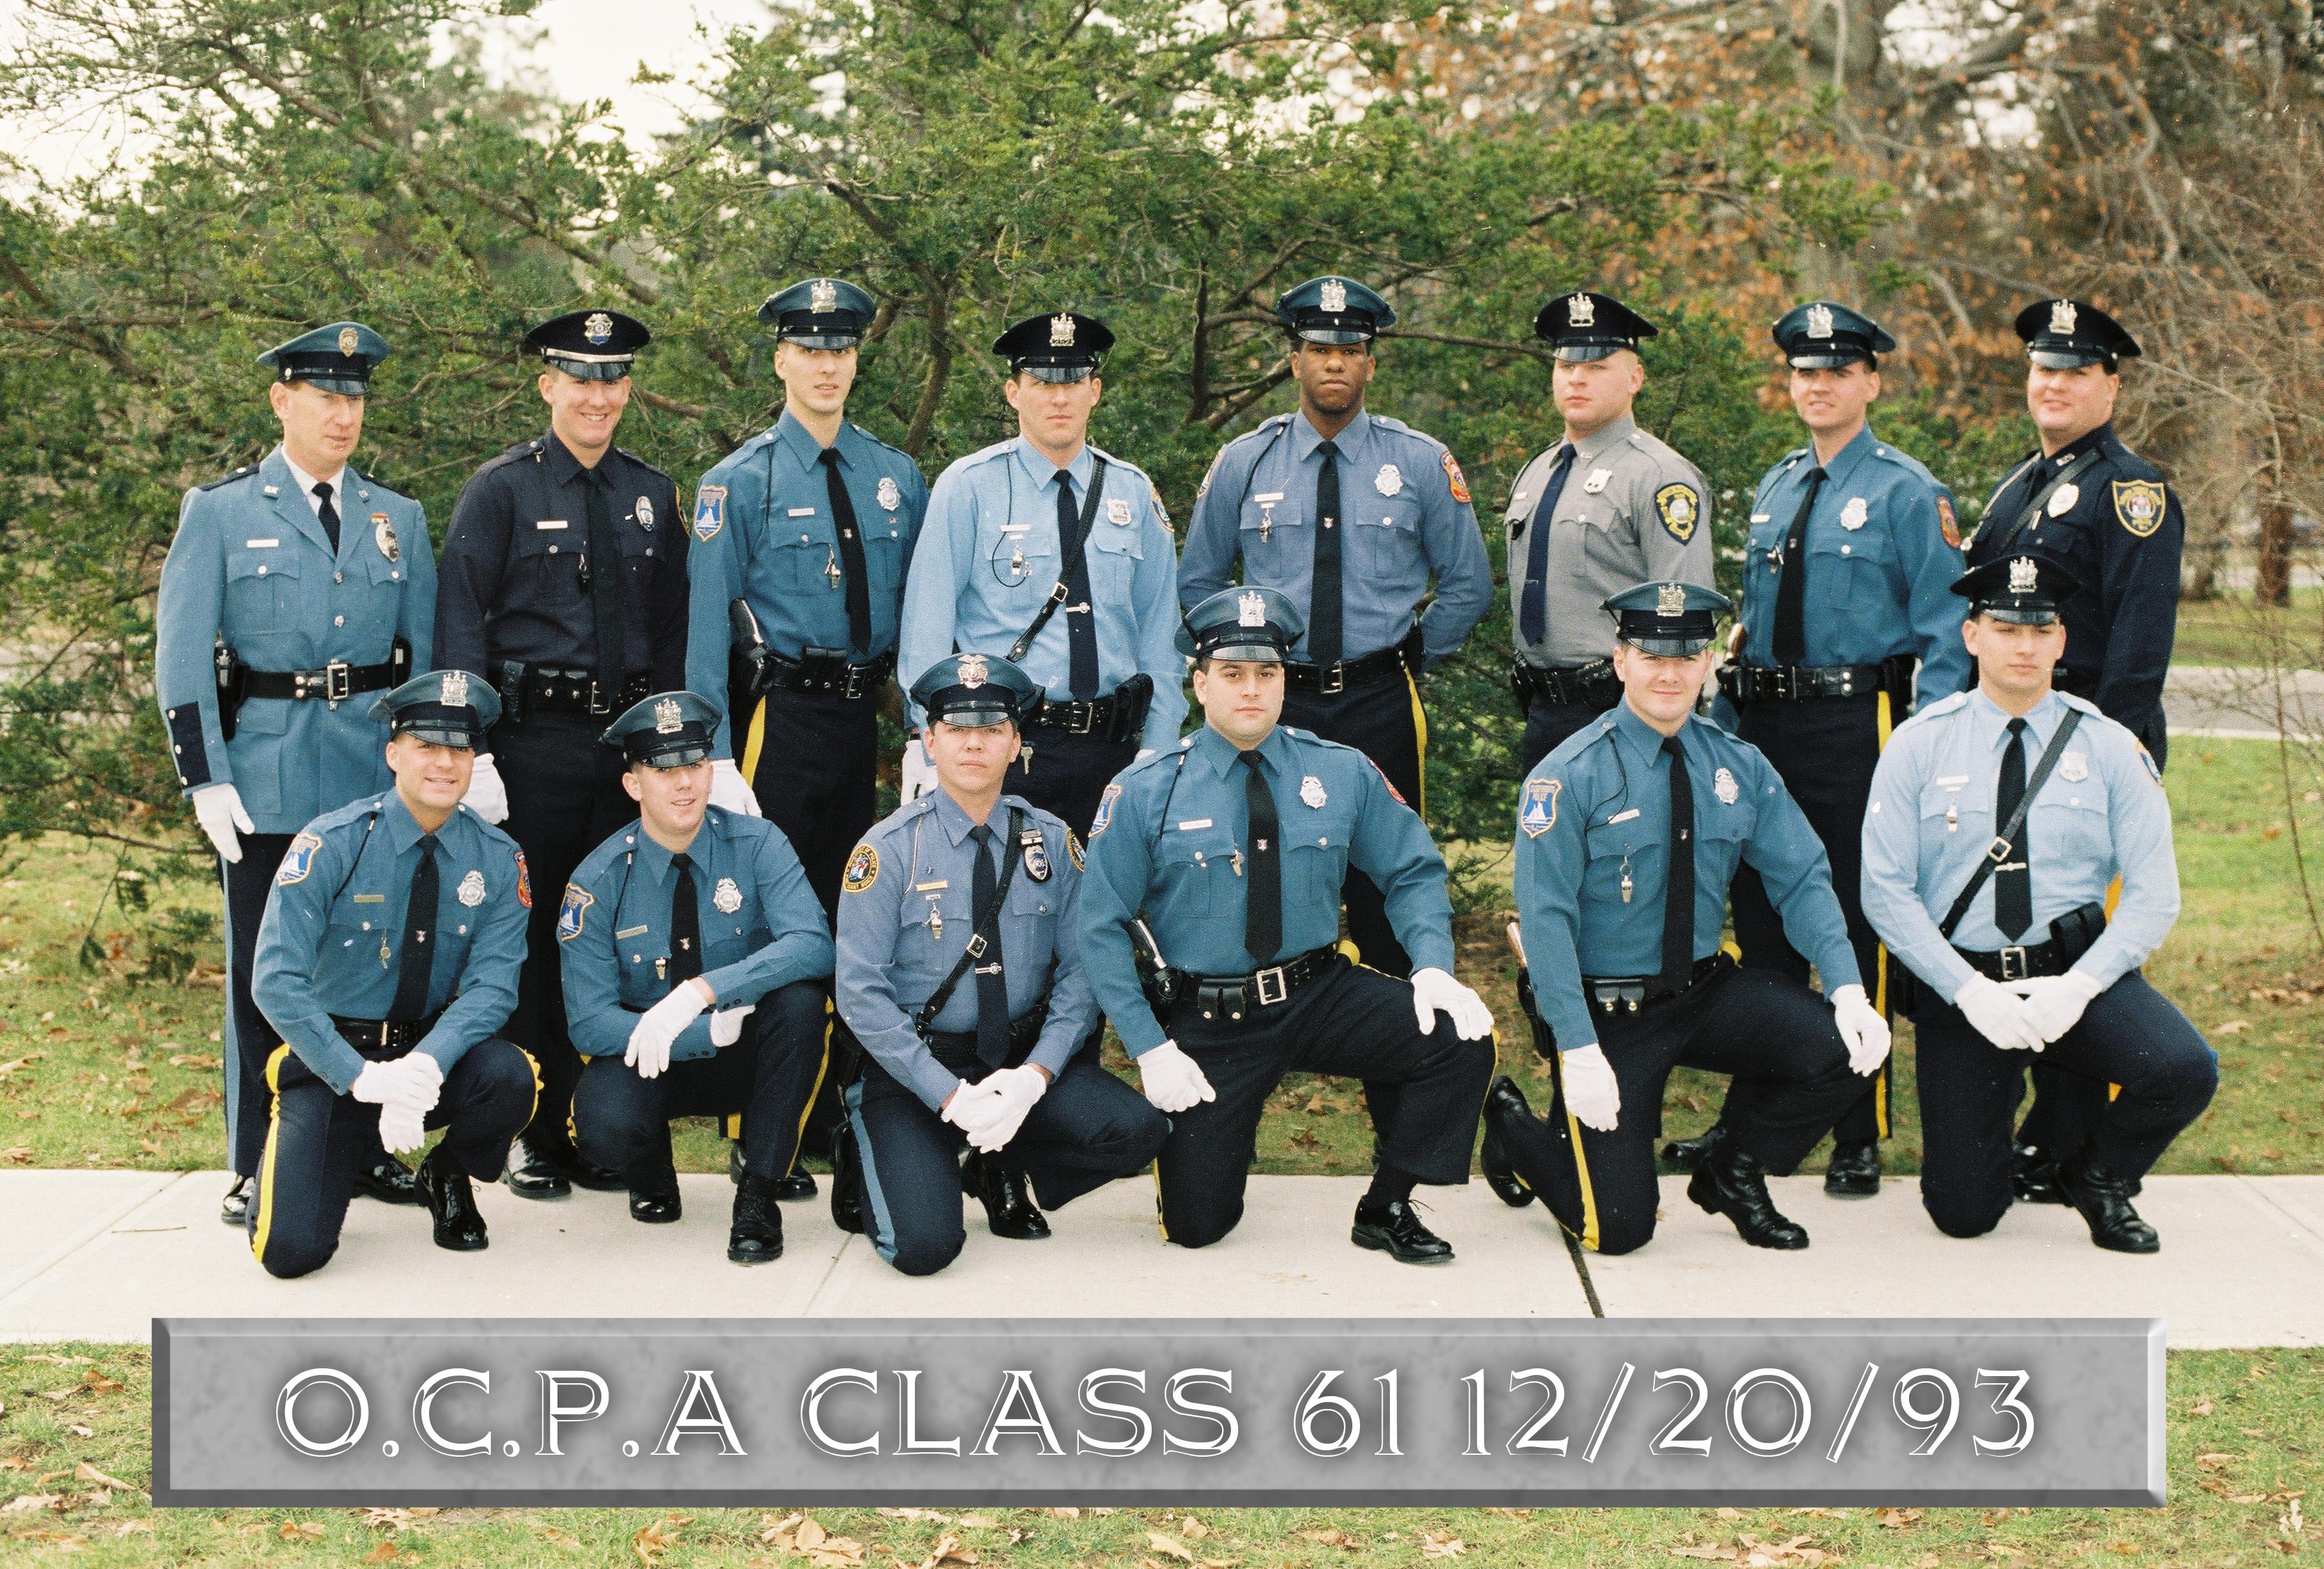 Class #61